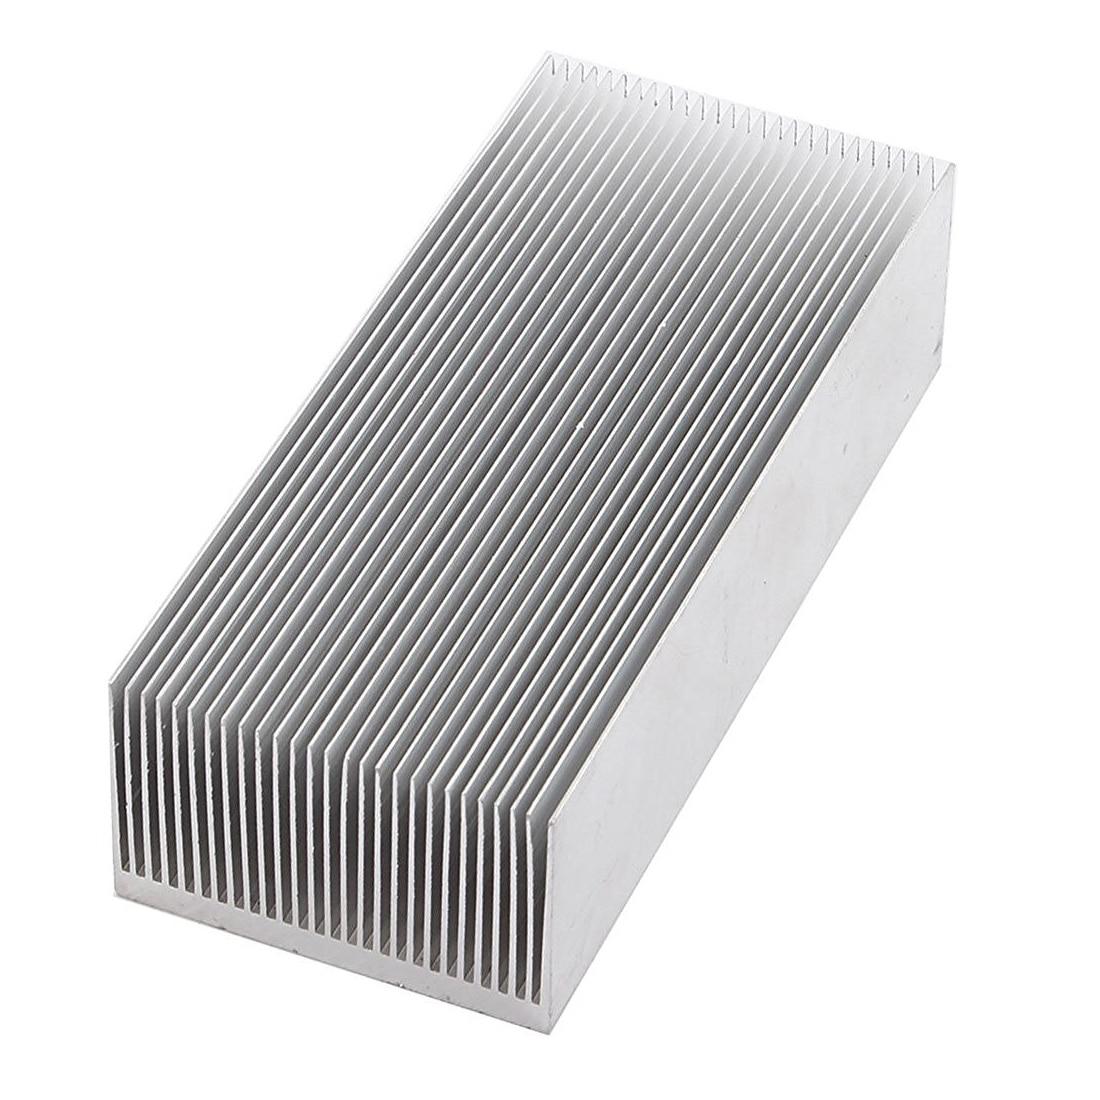 Aluminum Heat Radiator Heatsink Cooling Fin 150x69x37mm Silver Tone